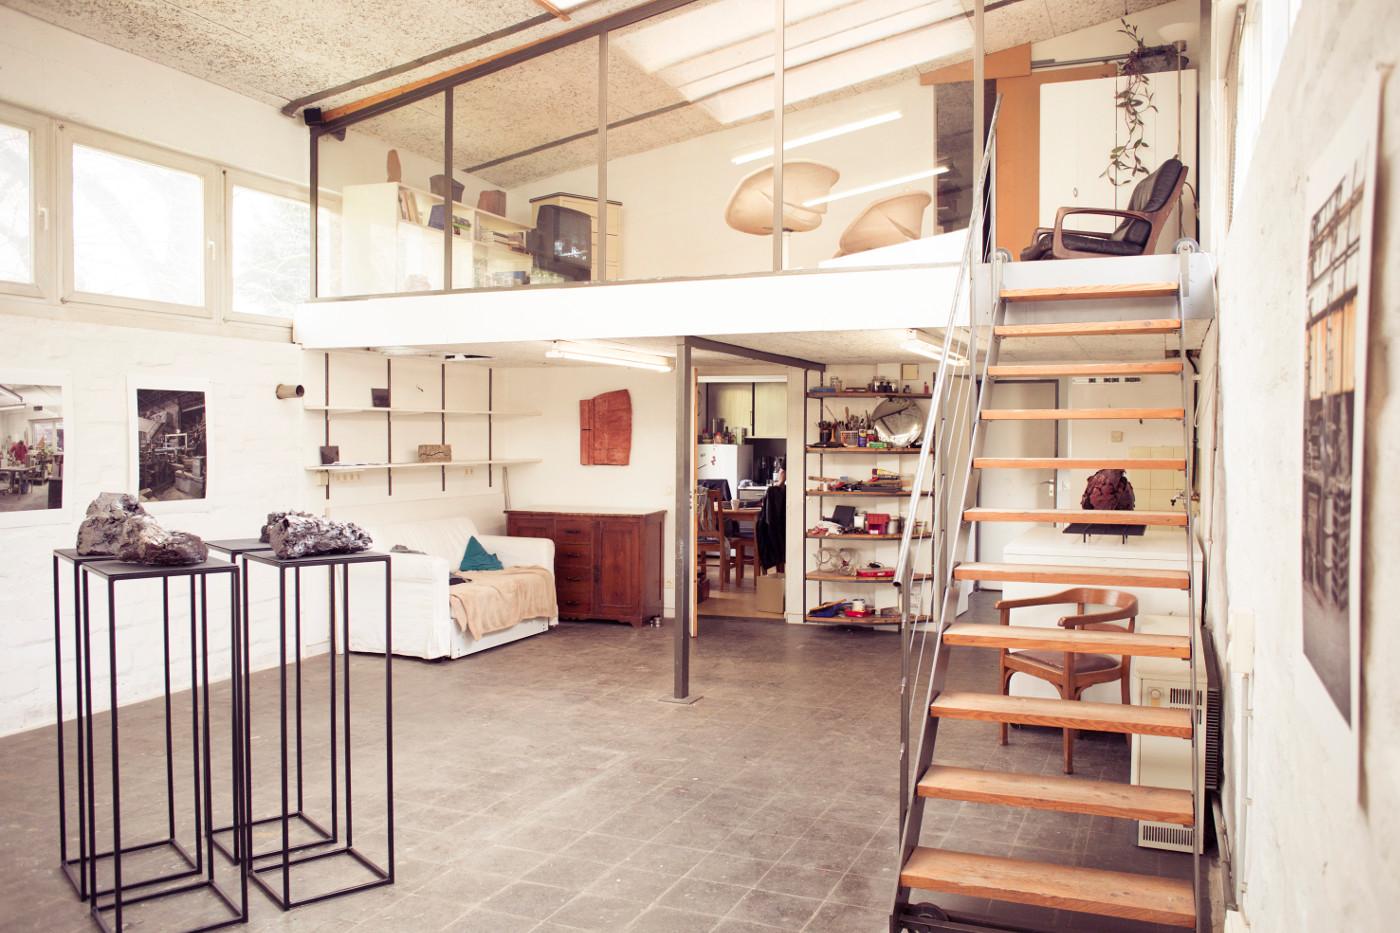 ein raum f r alle das atelier siegele an der rosenh he p stadtkultur darmstadtp stadtkultur. Black Bedroom Furniture Sets. Home Design Ideas